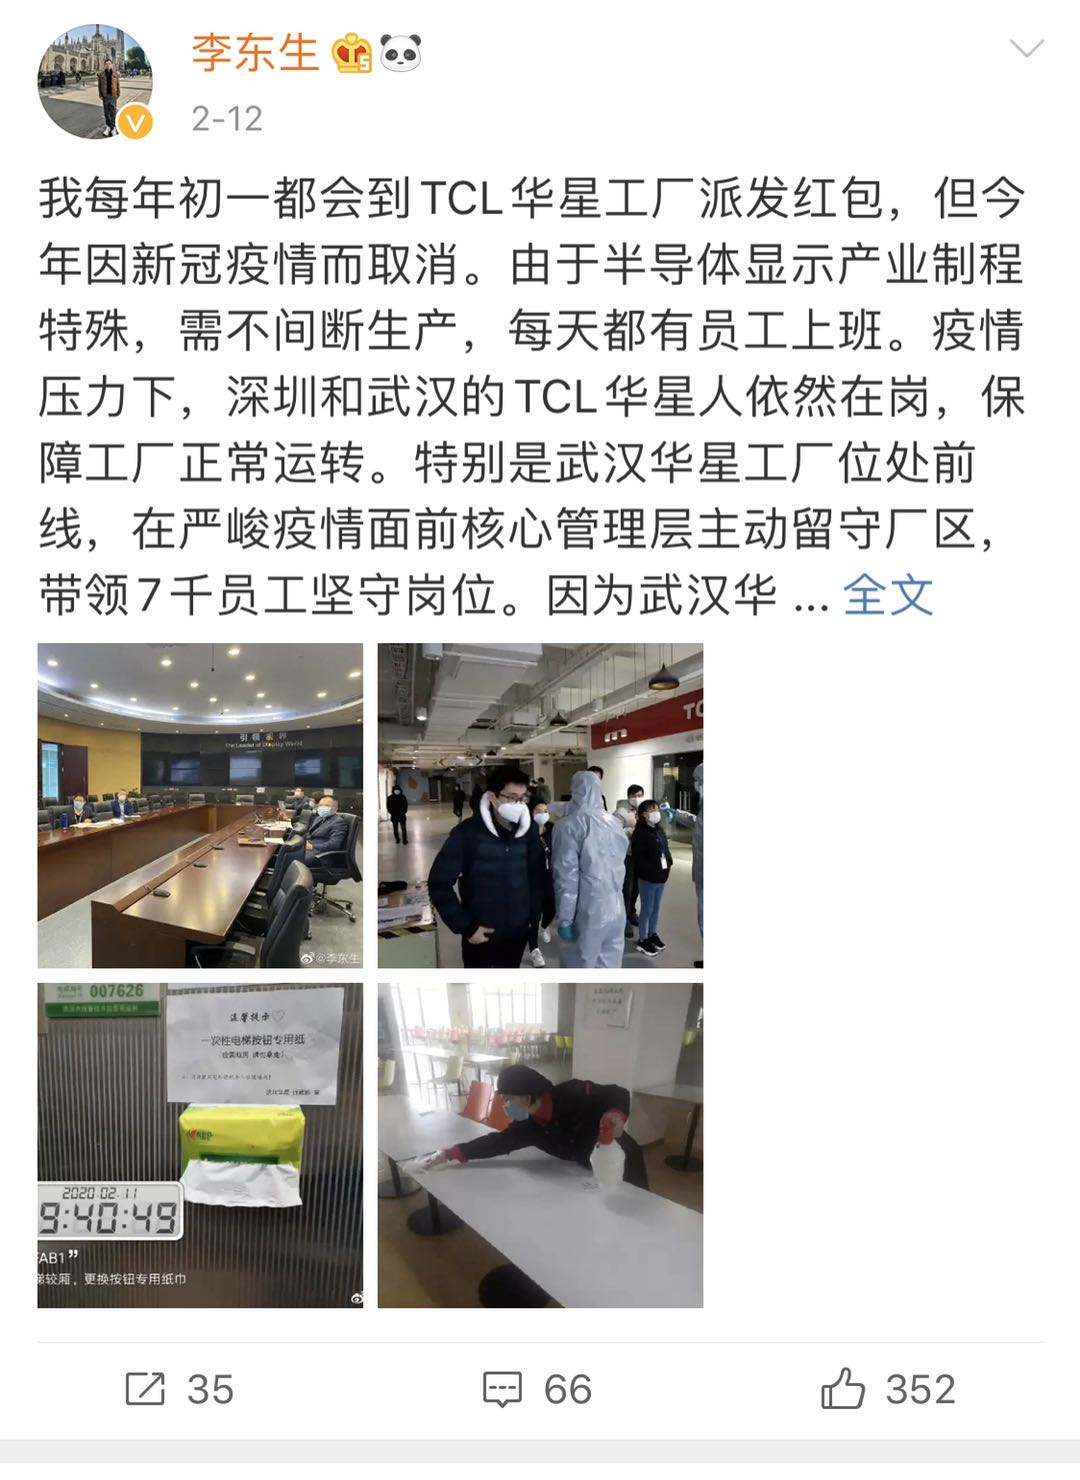 TCL科技称,2020年开年至今(2月11日),武汉华星t3面板产线持续满产,并于1月份提前完成岁修,目前产能50K/月,物料和人工可满足当前生产需要,产成品出货通道正常。2020年2月1日至2月10日,t3累计投片量与去年同期持平,预计2月将持续满产运营。